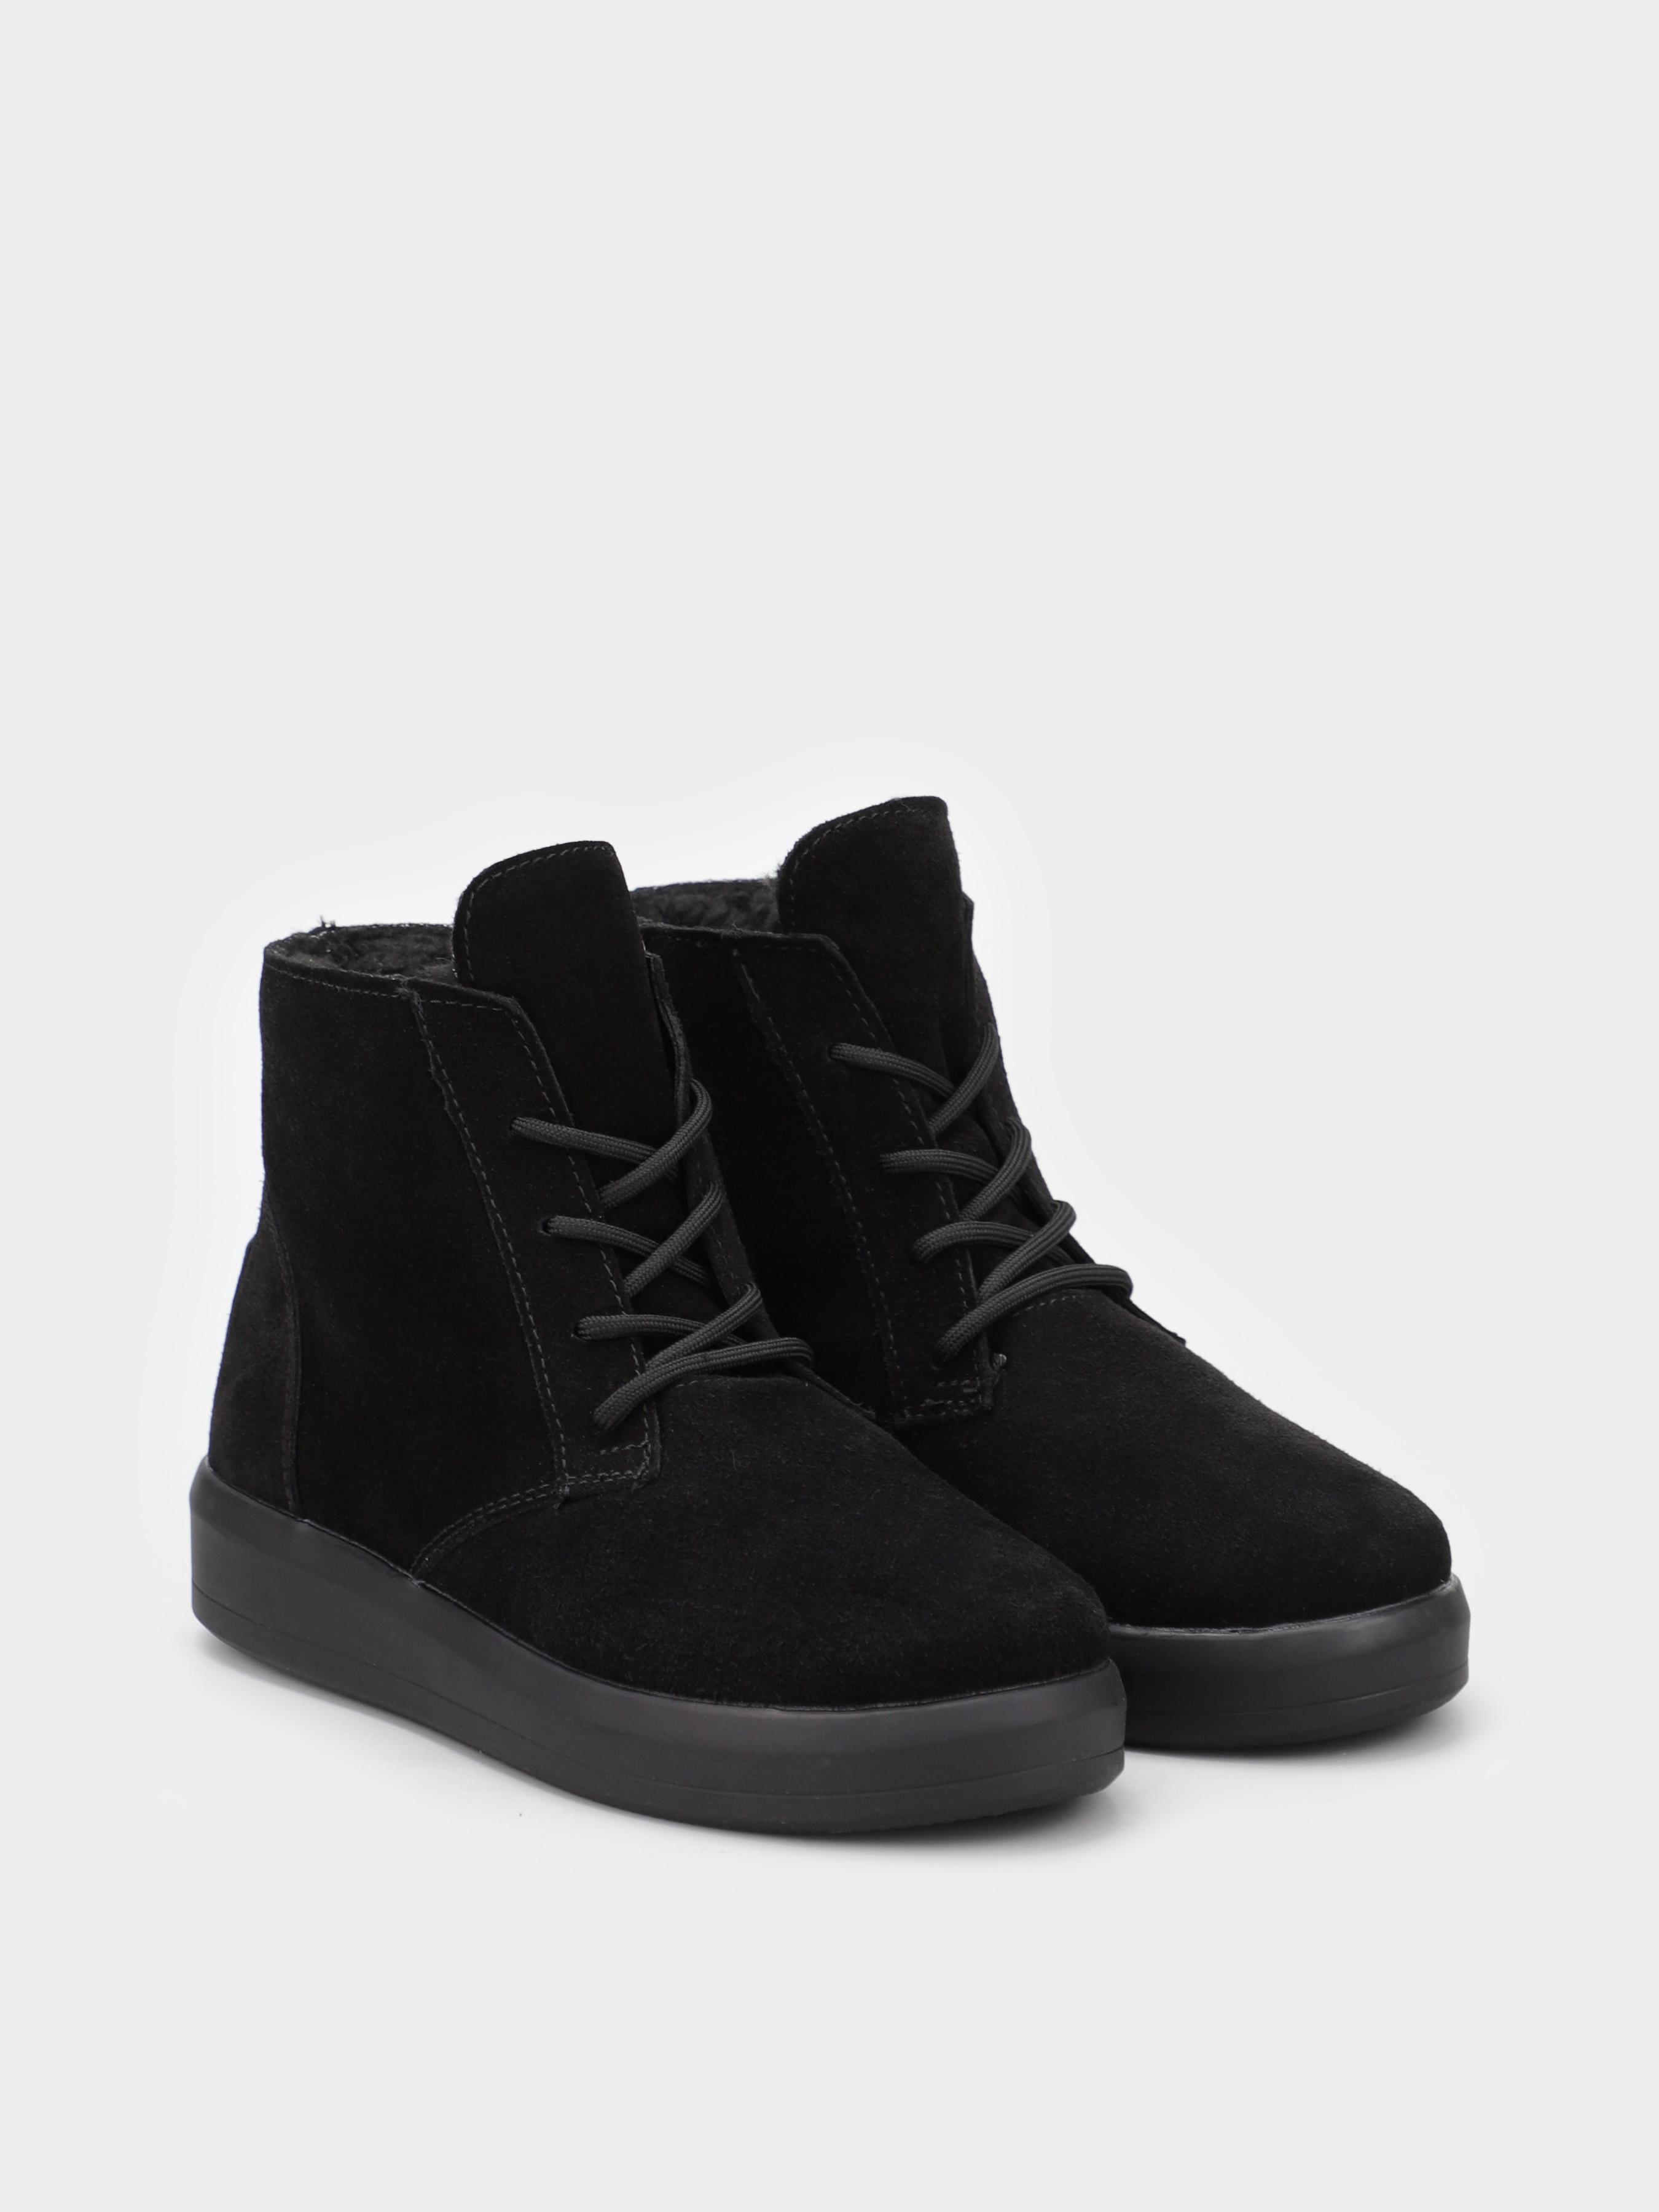 Ботинки женские Dino Vittorio 6H73 продажа, 2017